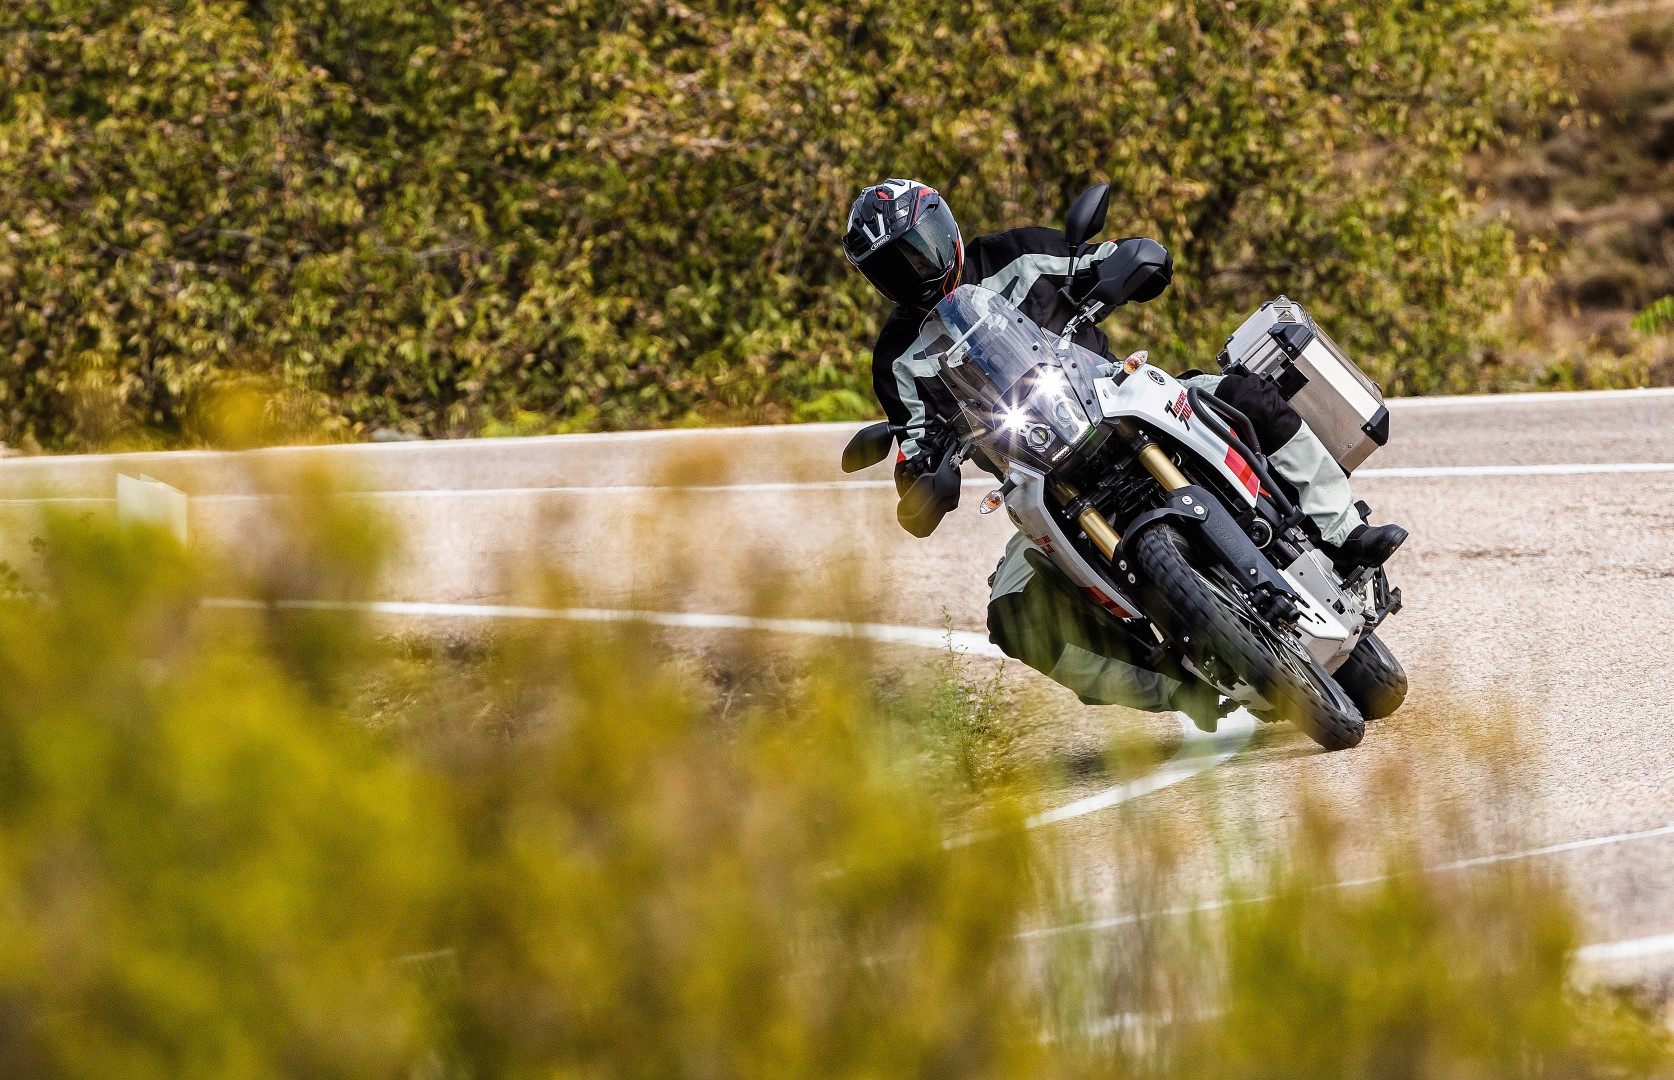 Yamaha Ténéré 700, superprueba, fotos y ficha técnica